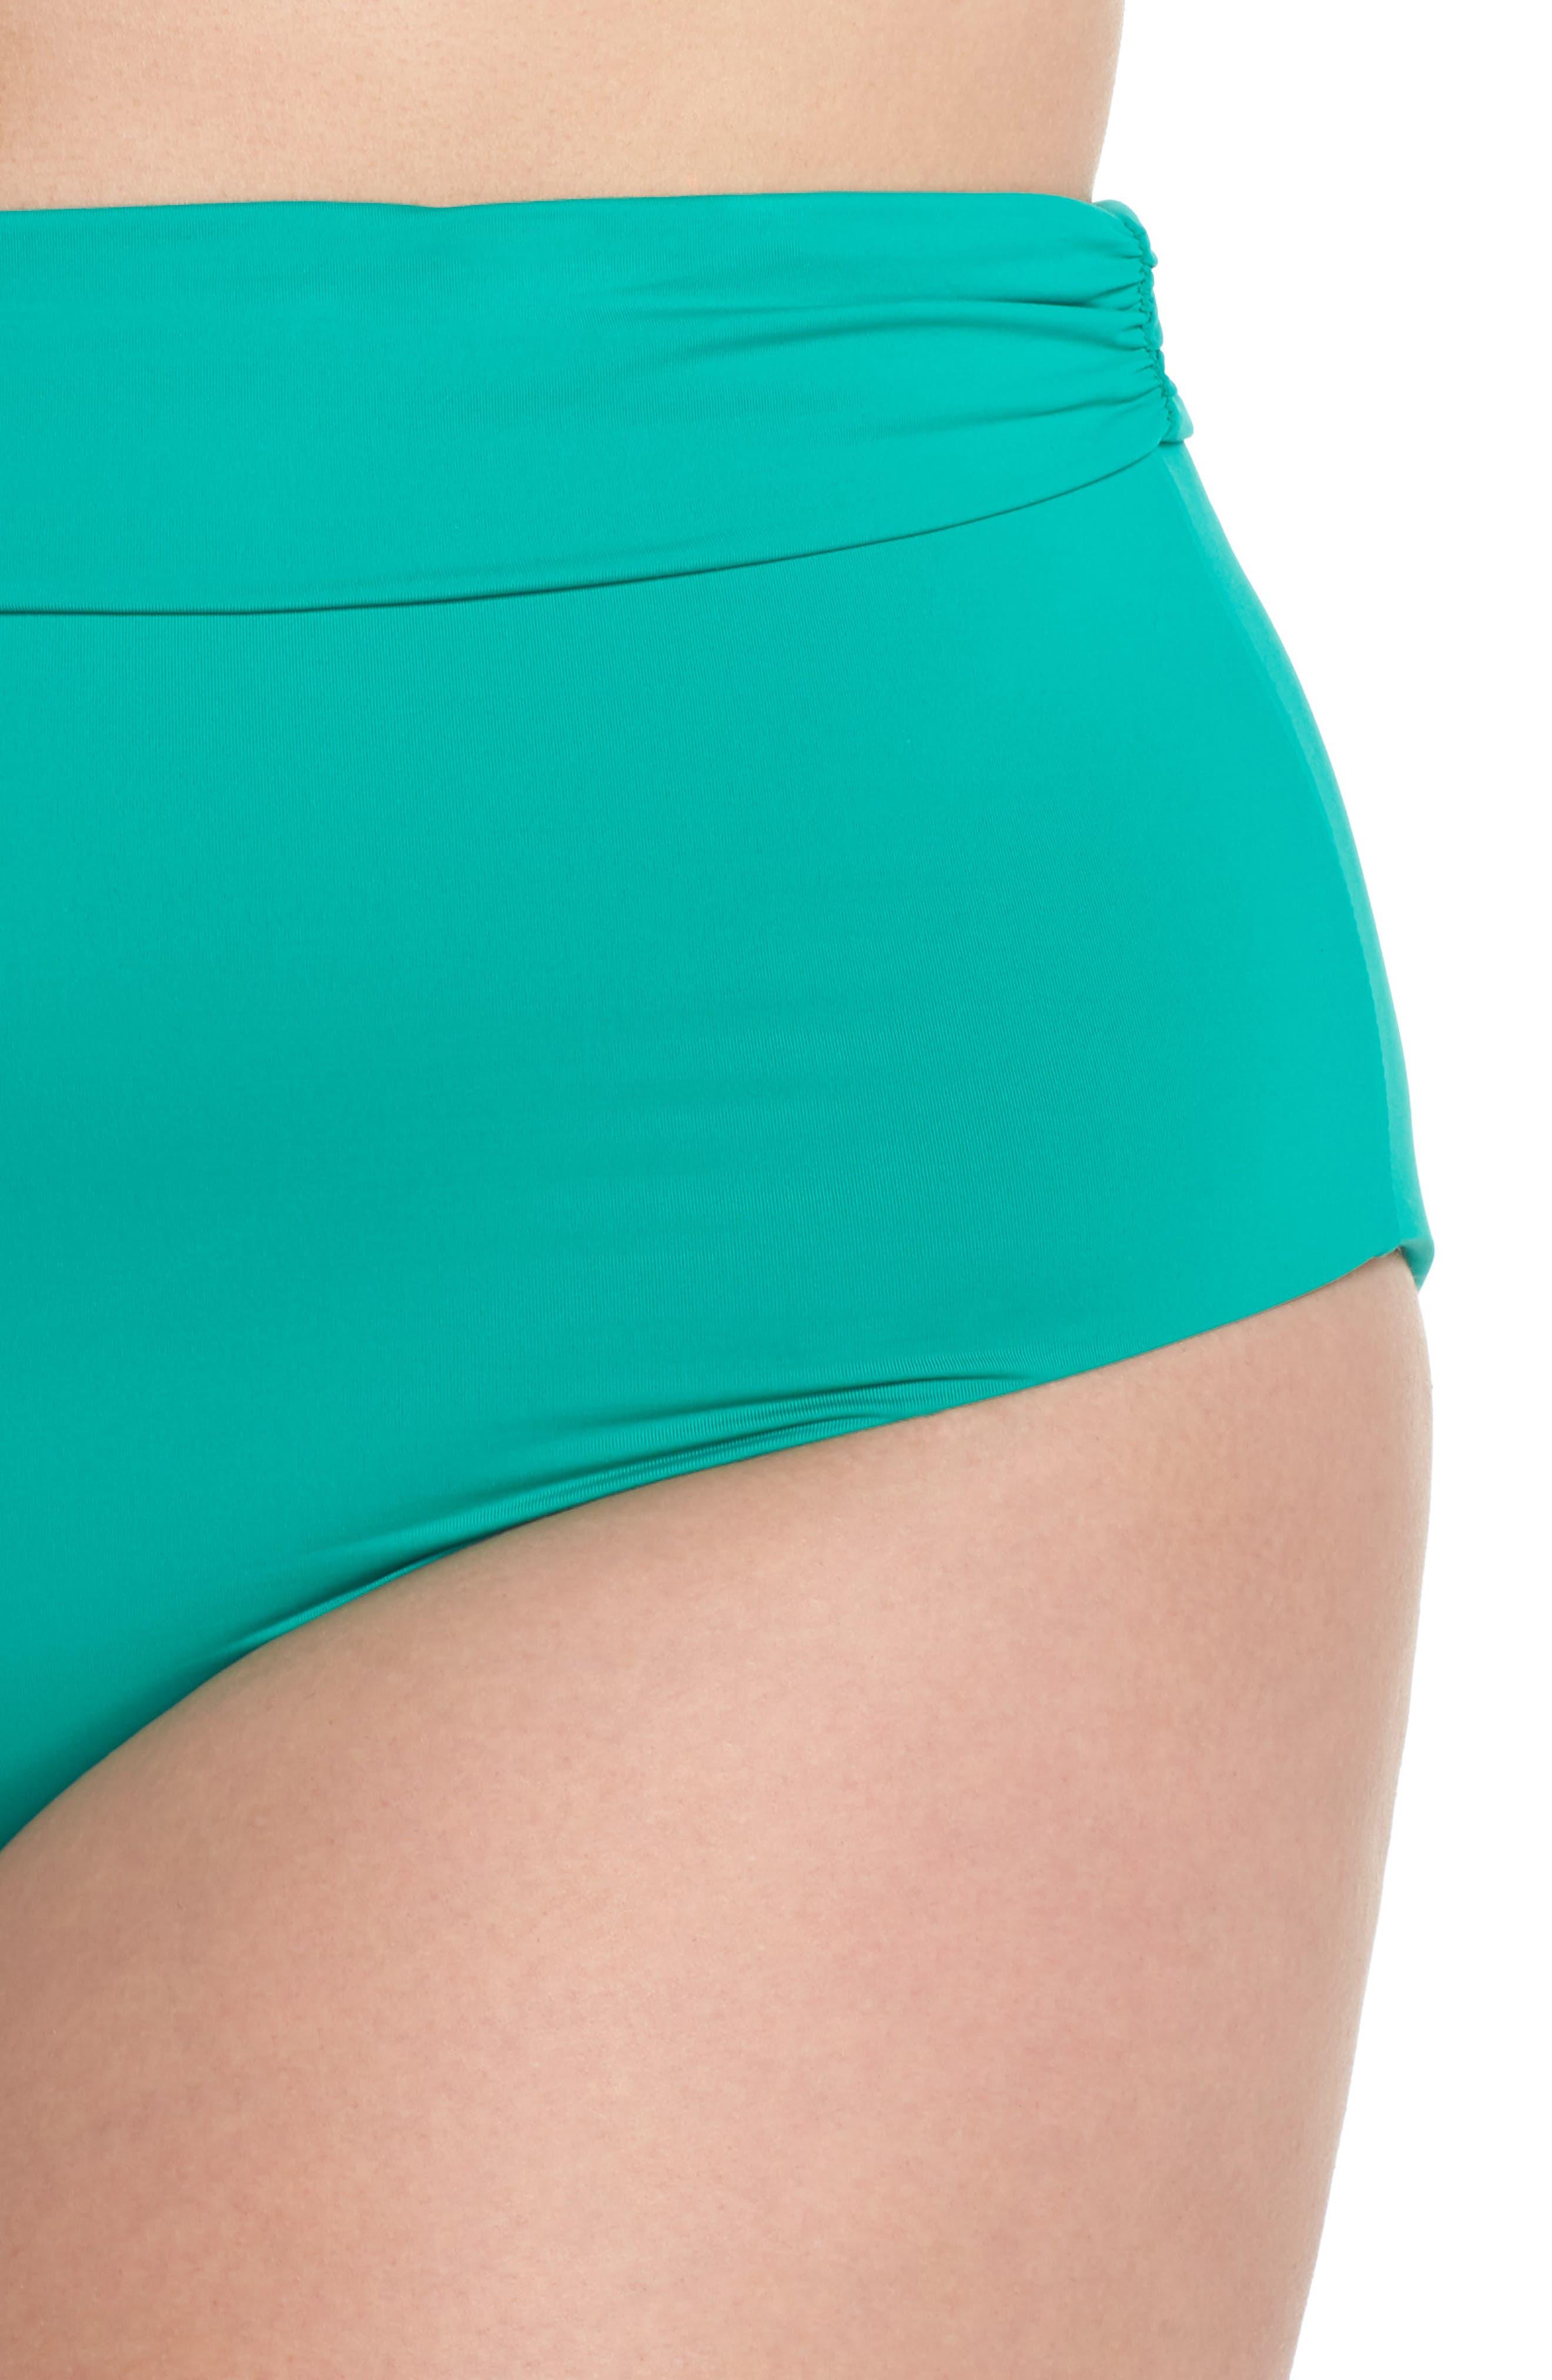 Color Splash High Waist Bikini Bottoms,                             Alternate thumbnail 4, color,                             305